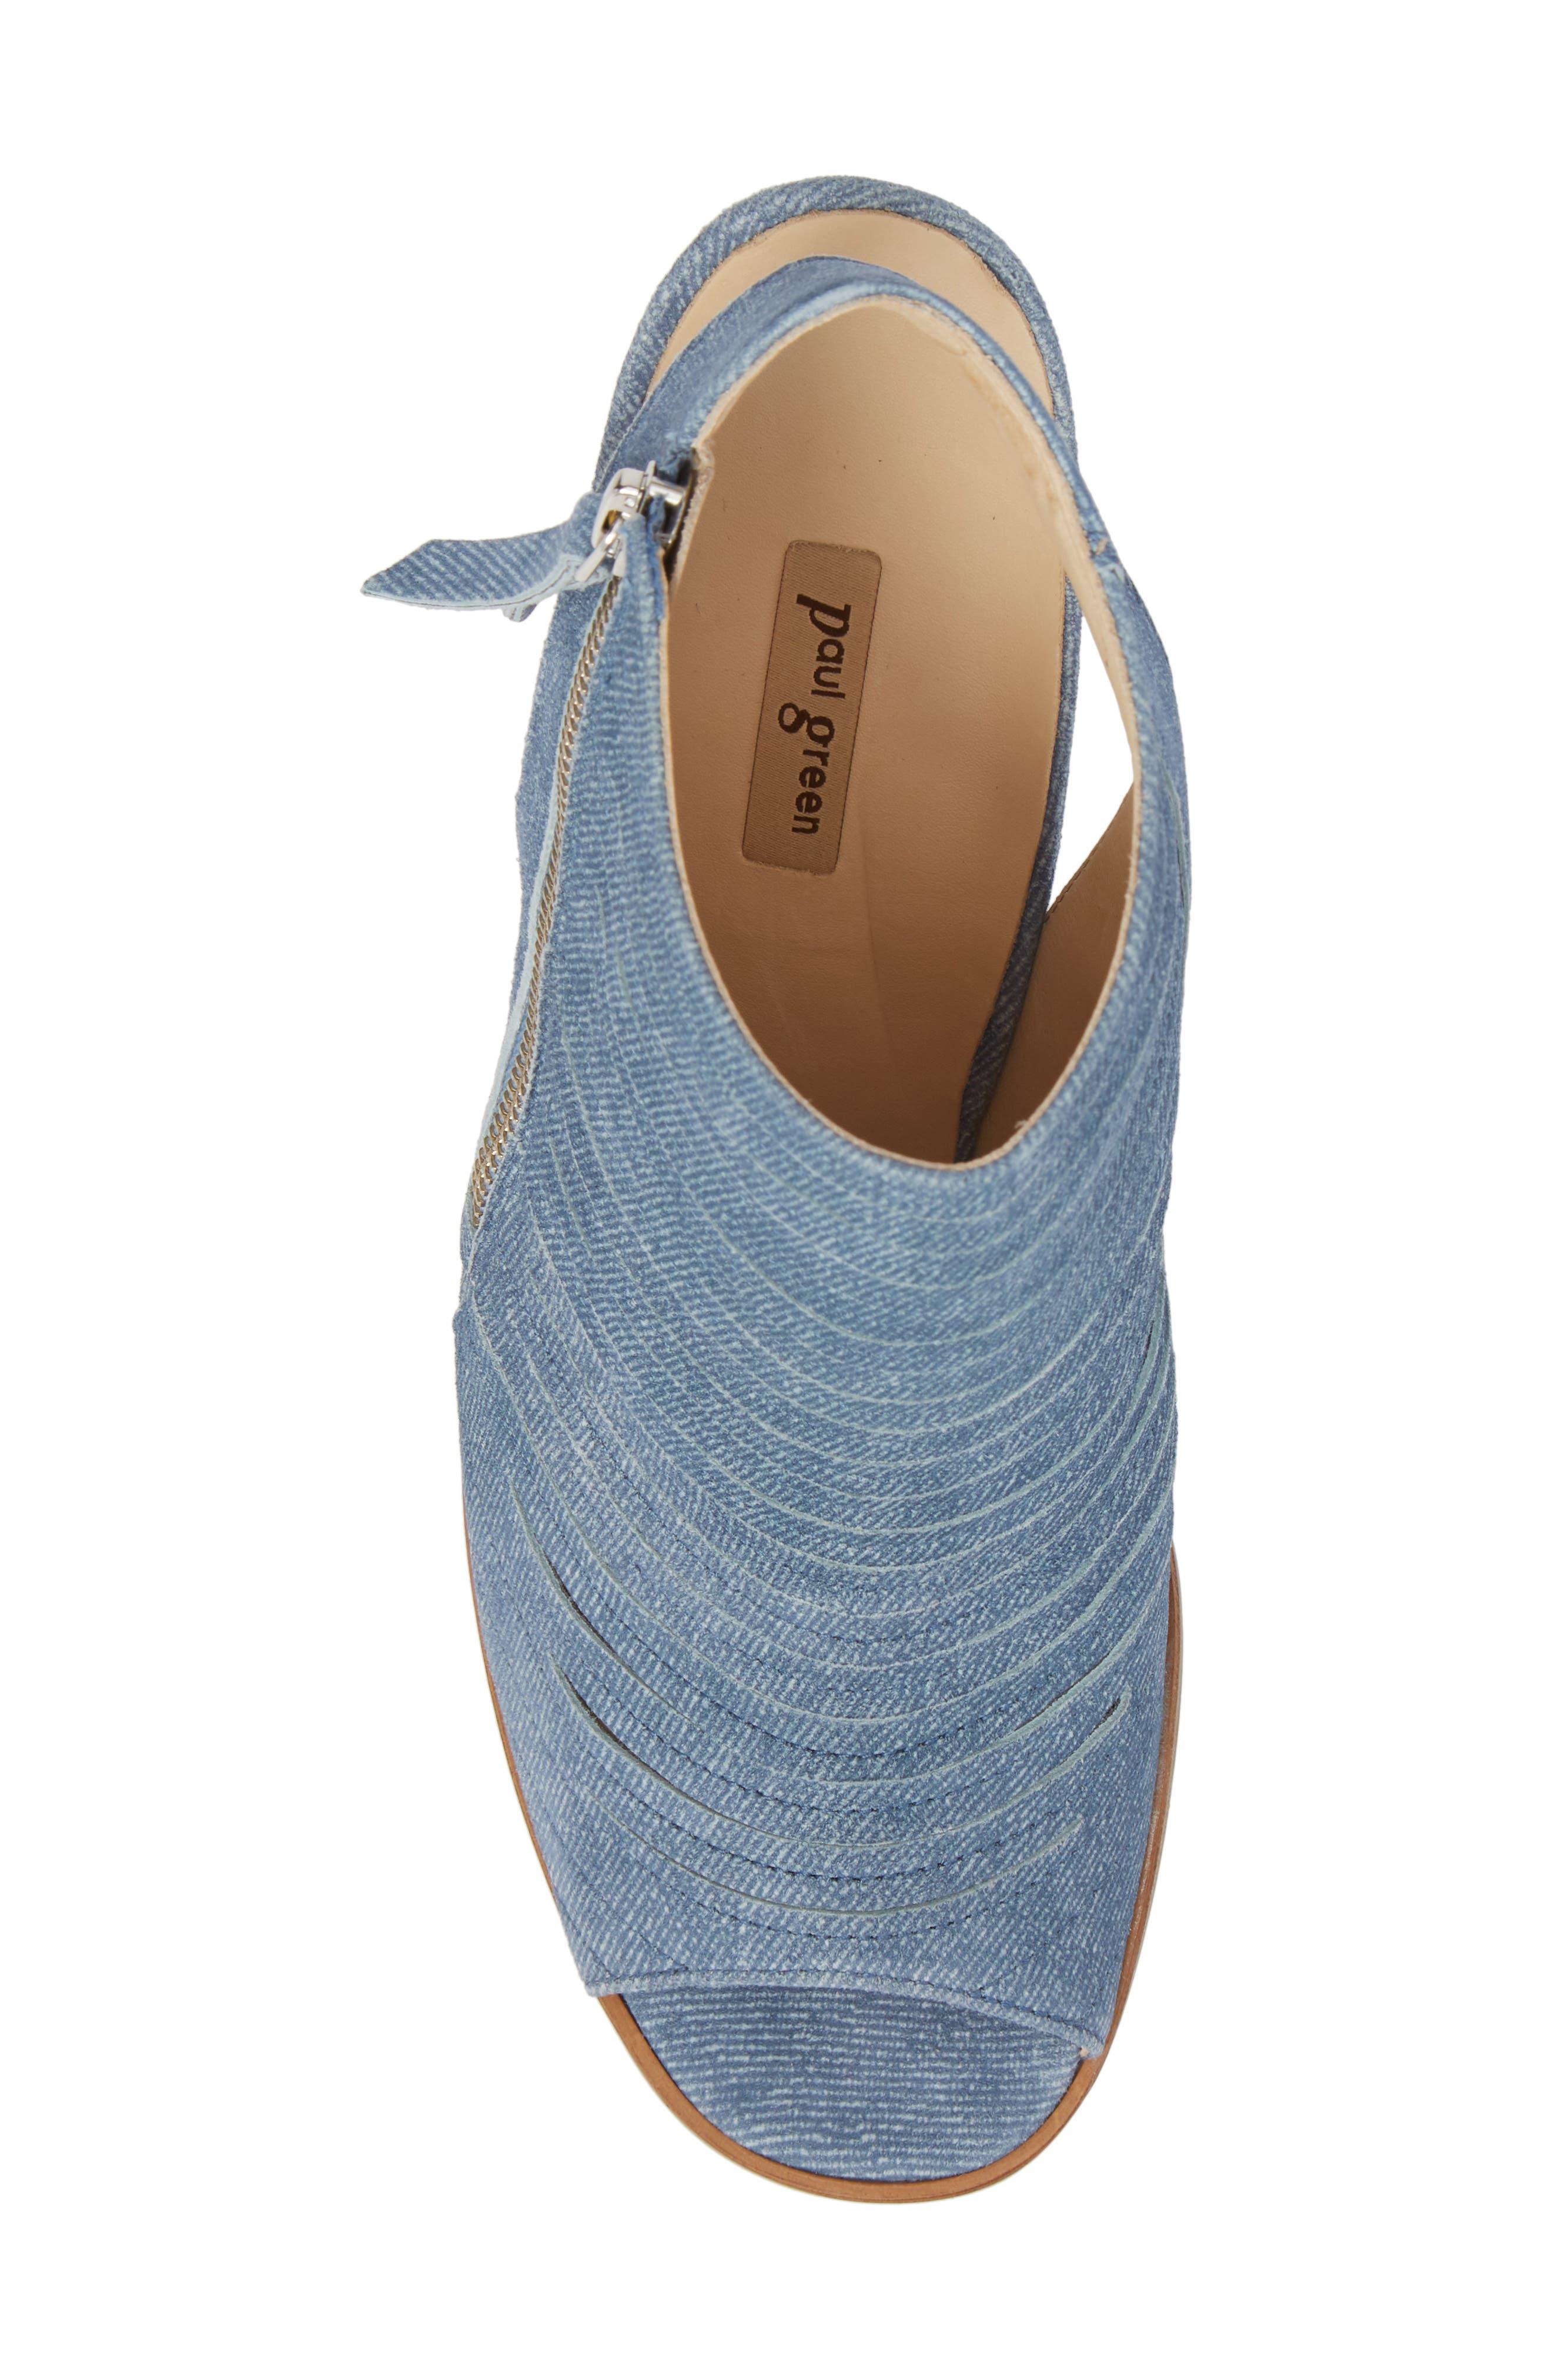 'Cayanne' Leather Peep Toe Sandal,                             Alternate thumbnail 38, color,